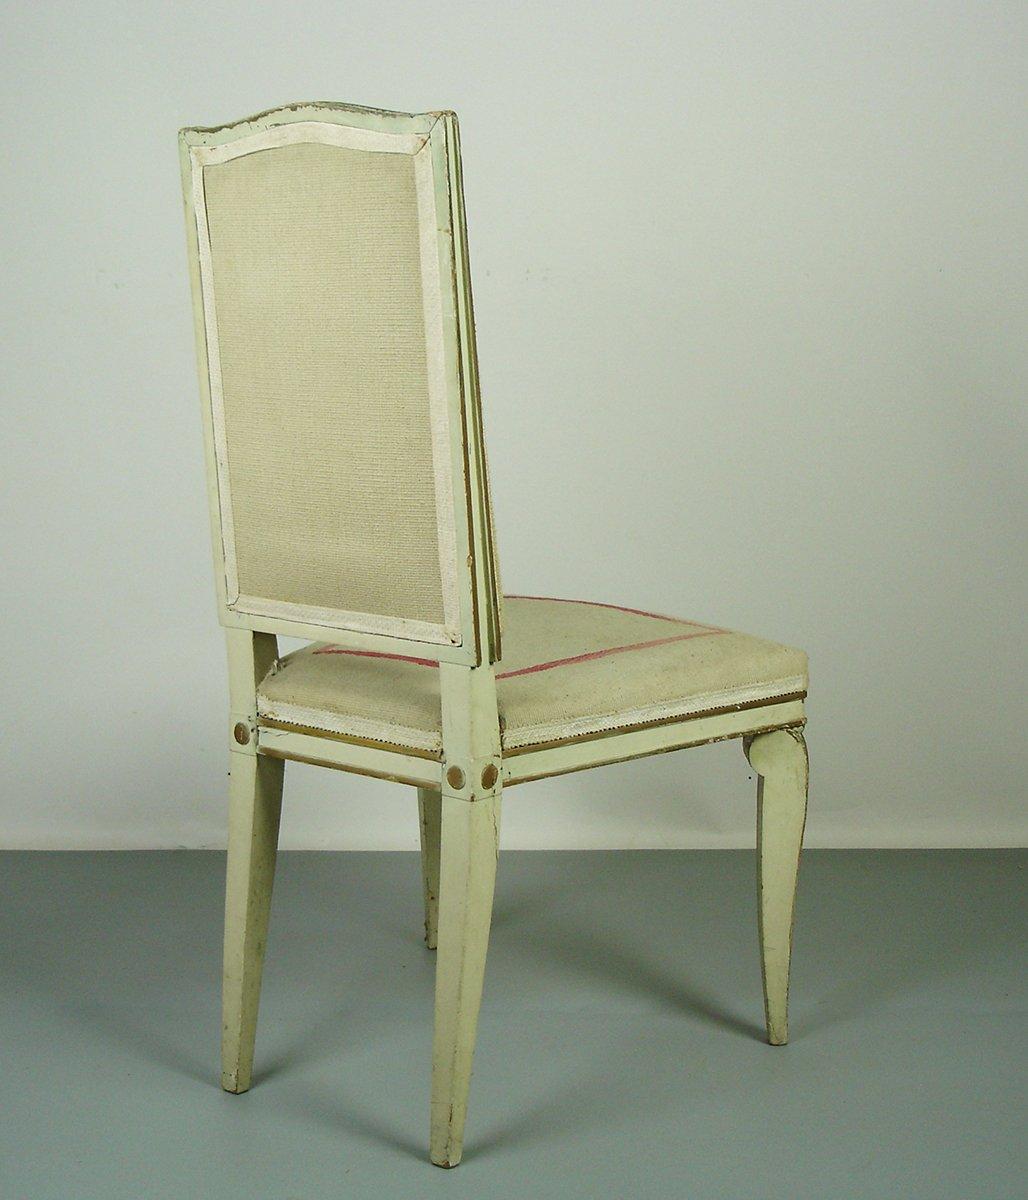 vintage stuhl von andr arbus bei pamono kaufen. Black Bedroom Furniture Sets. Home Design Ideas